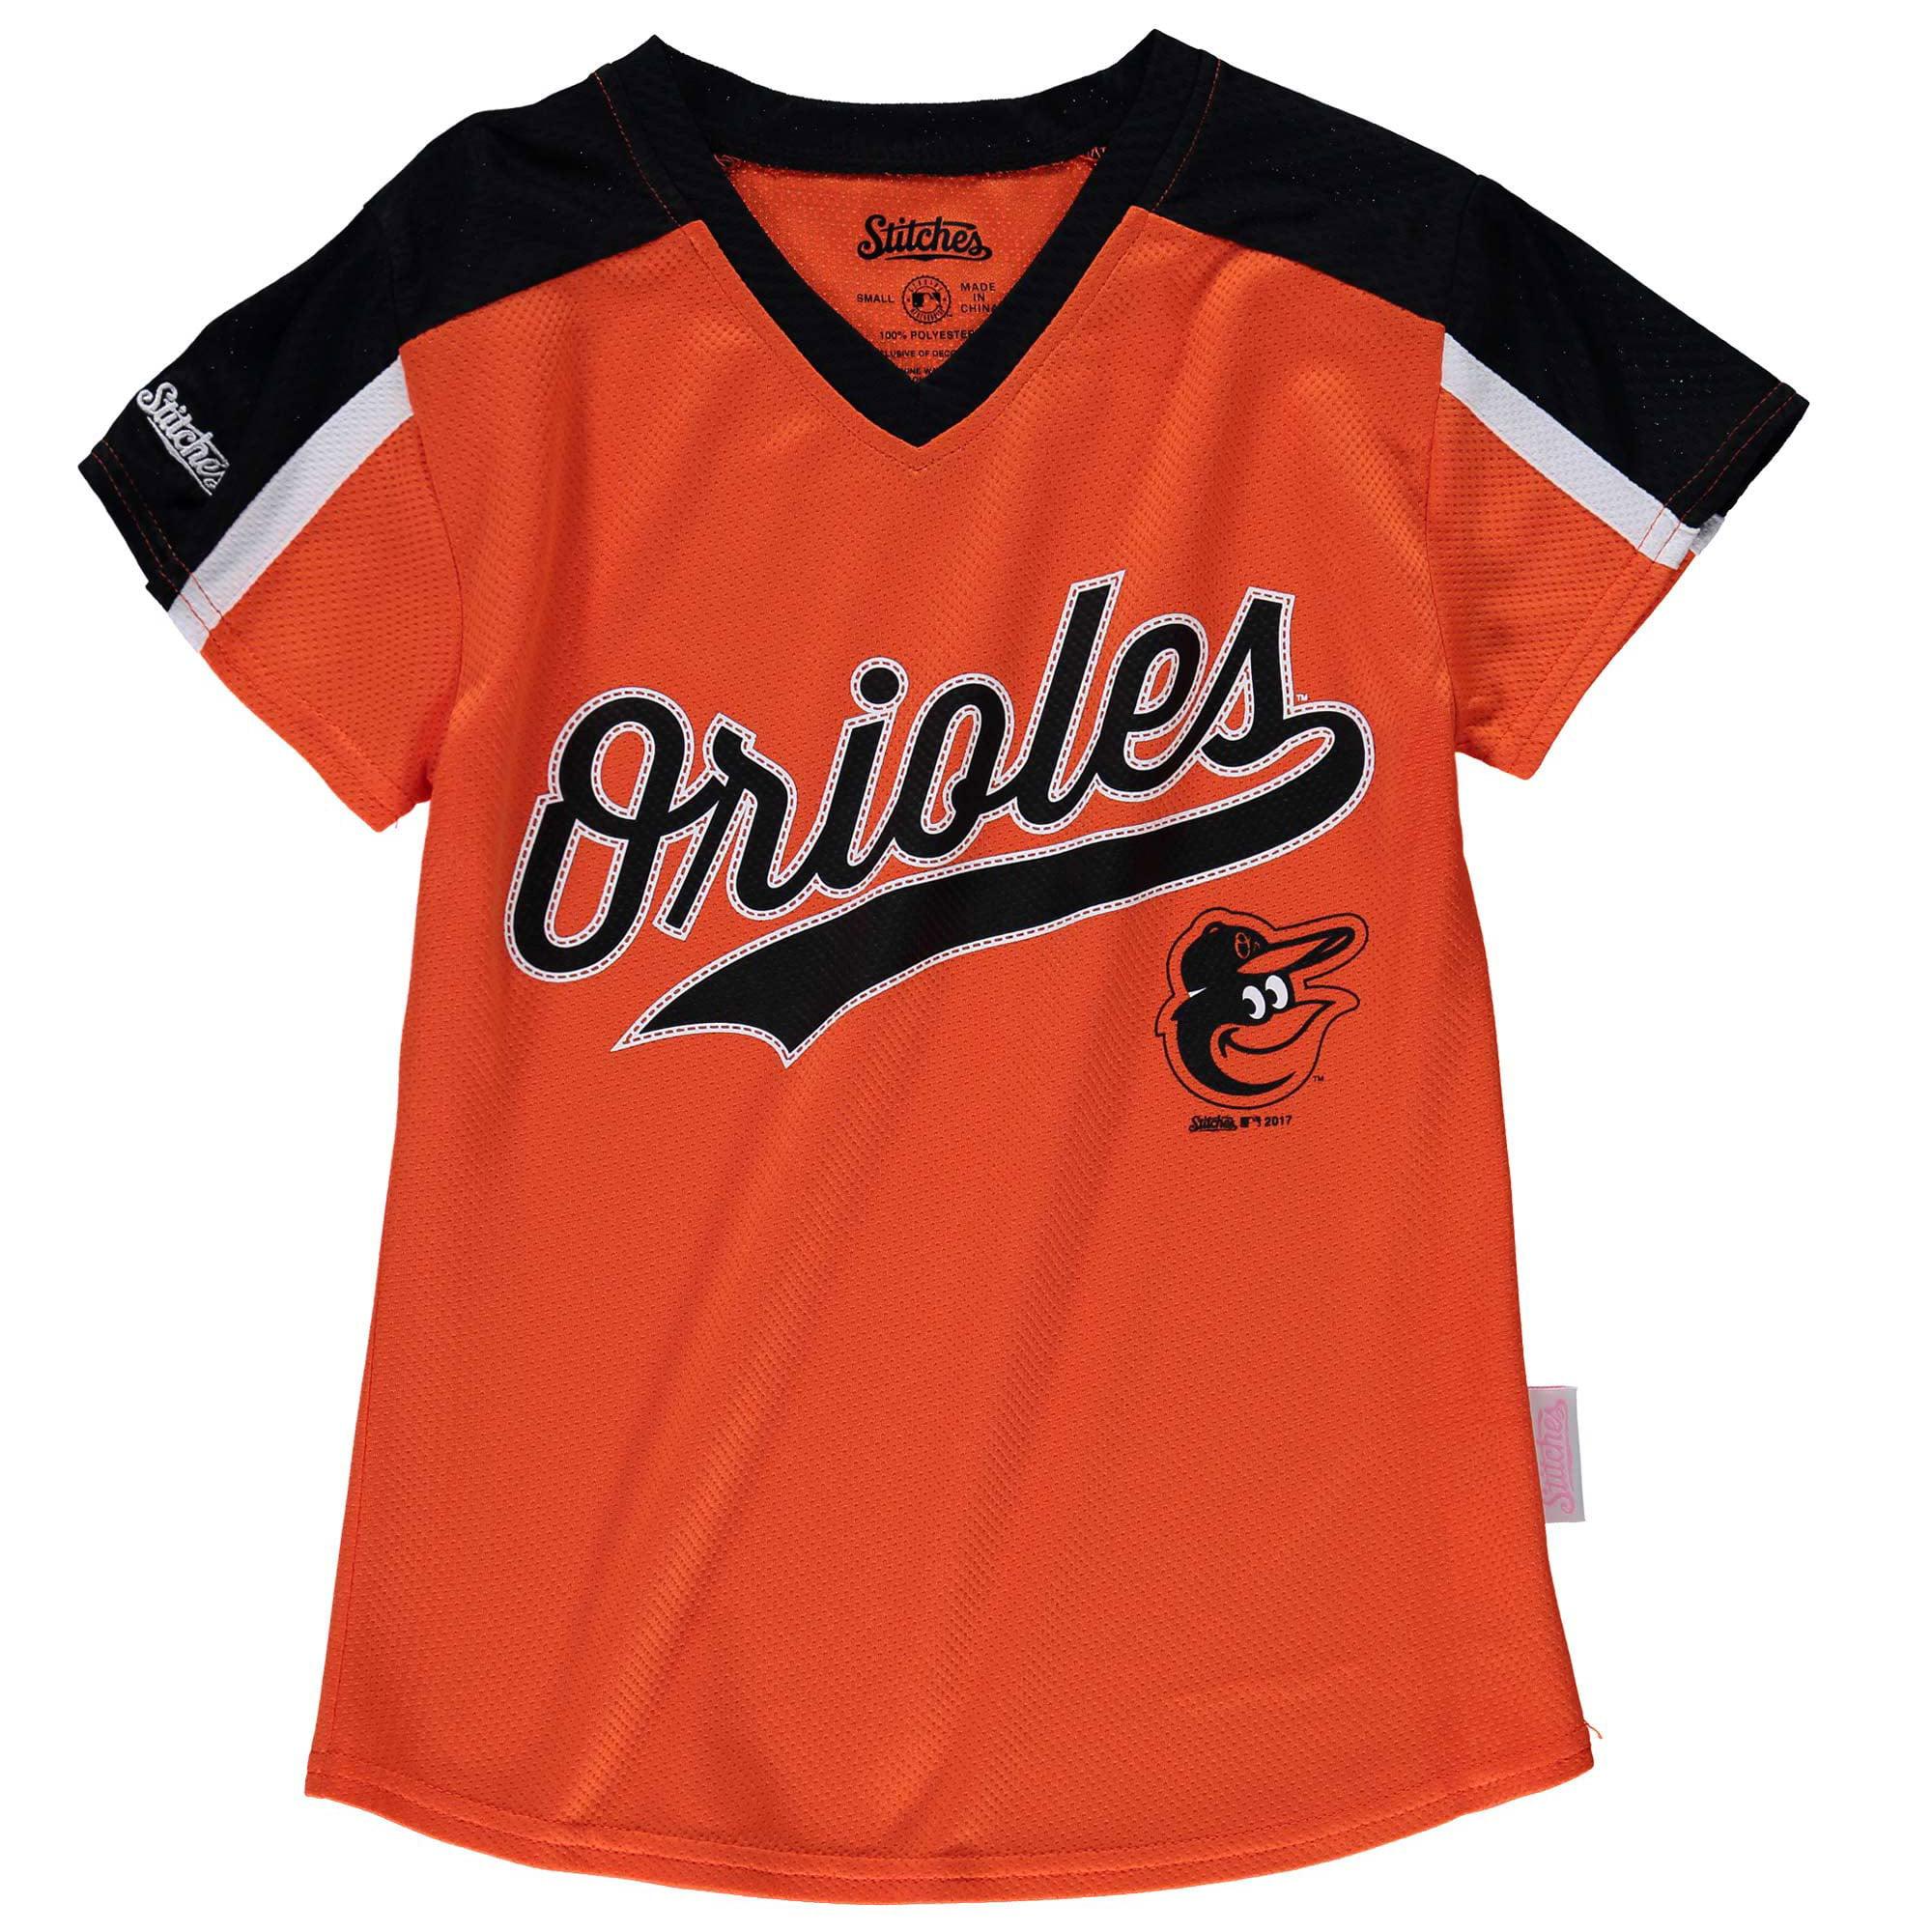 Baltimore Orioles Stitches Girls Youth V-Neck Jersey T-Shirt - Orange/Black